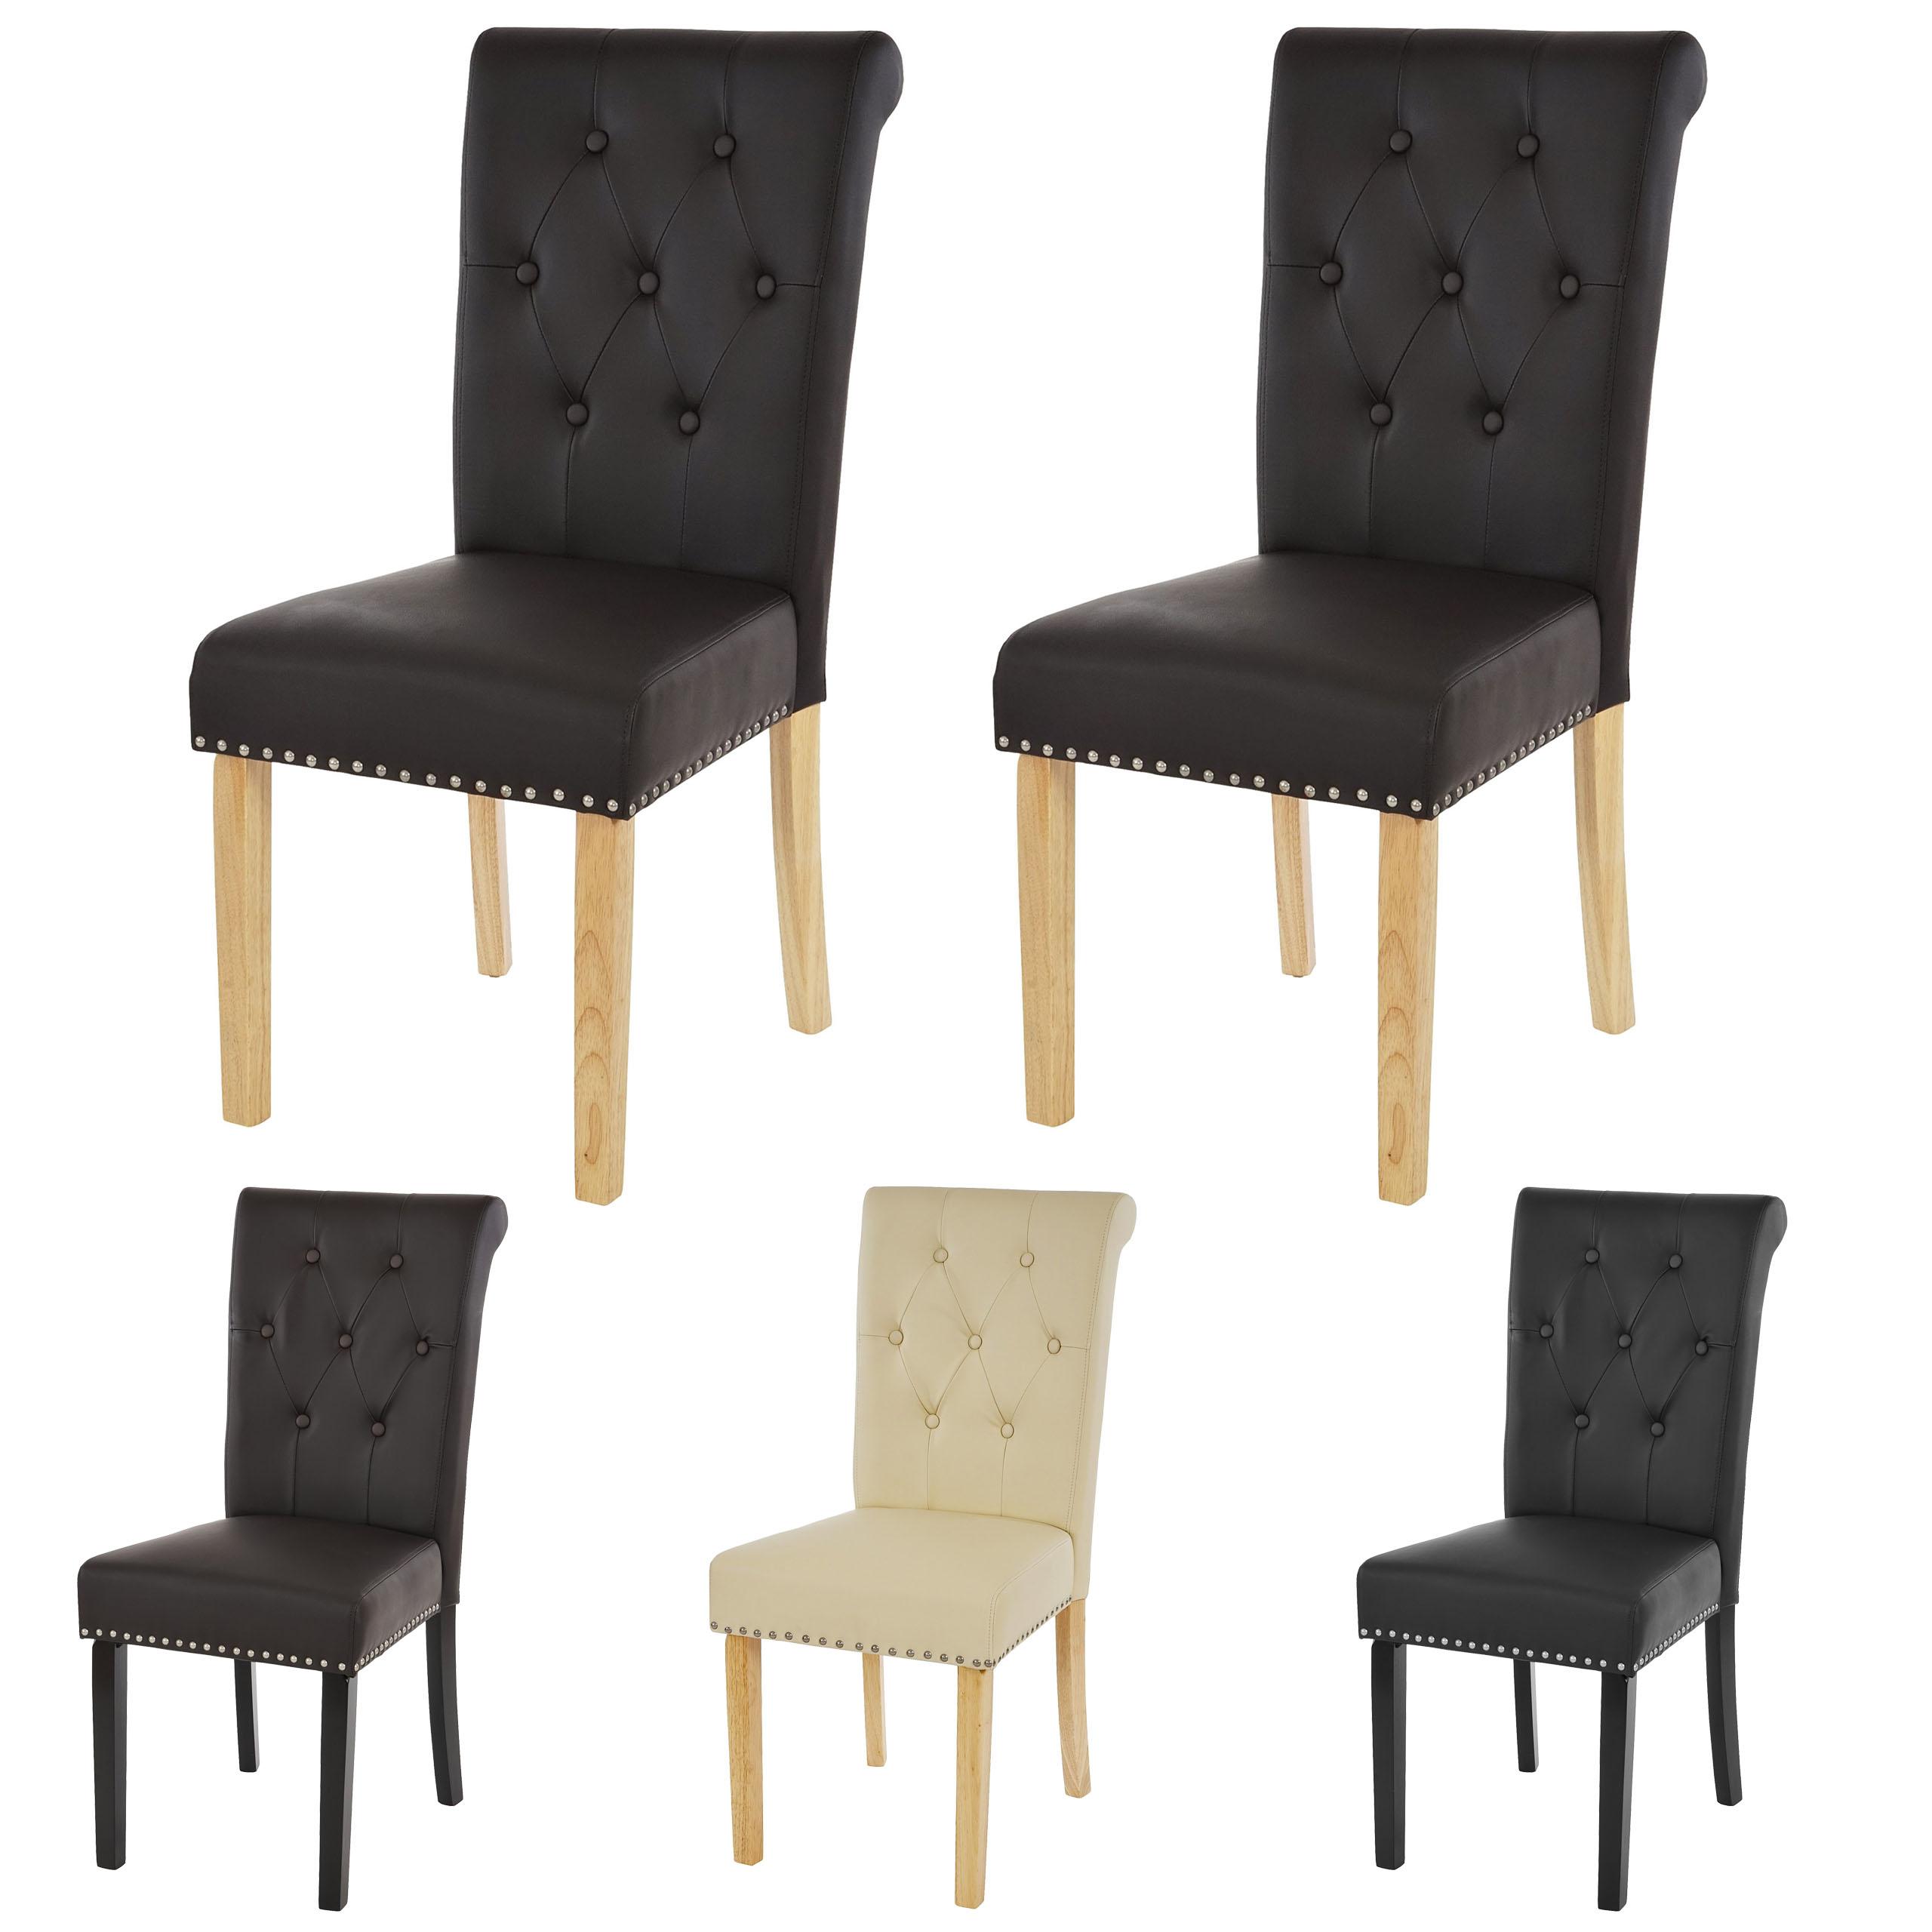 2x esszimmerstuhl chesterfield ii lehnstuhl stuhl nieten kunstleder ebay. Black Bedroom Furniture Sets. Home Design Ideas